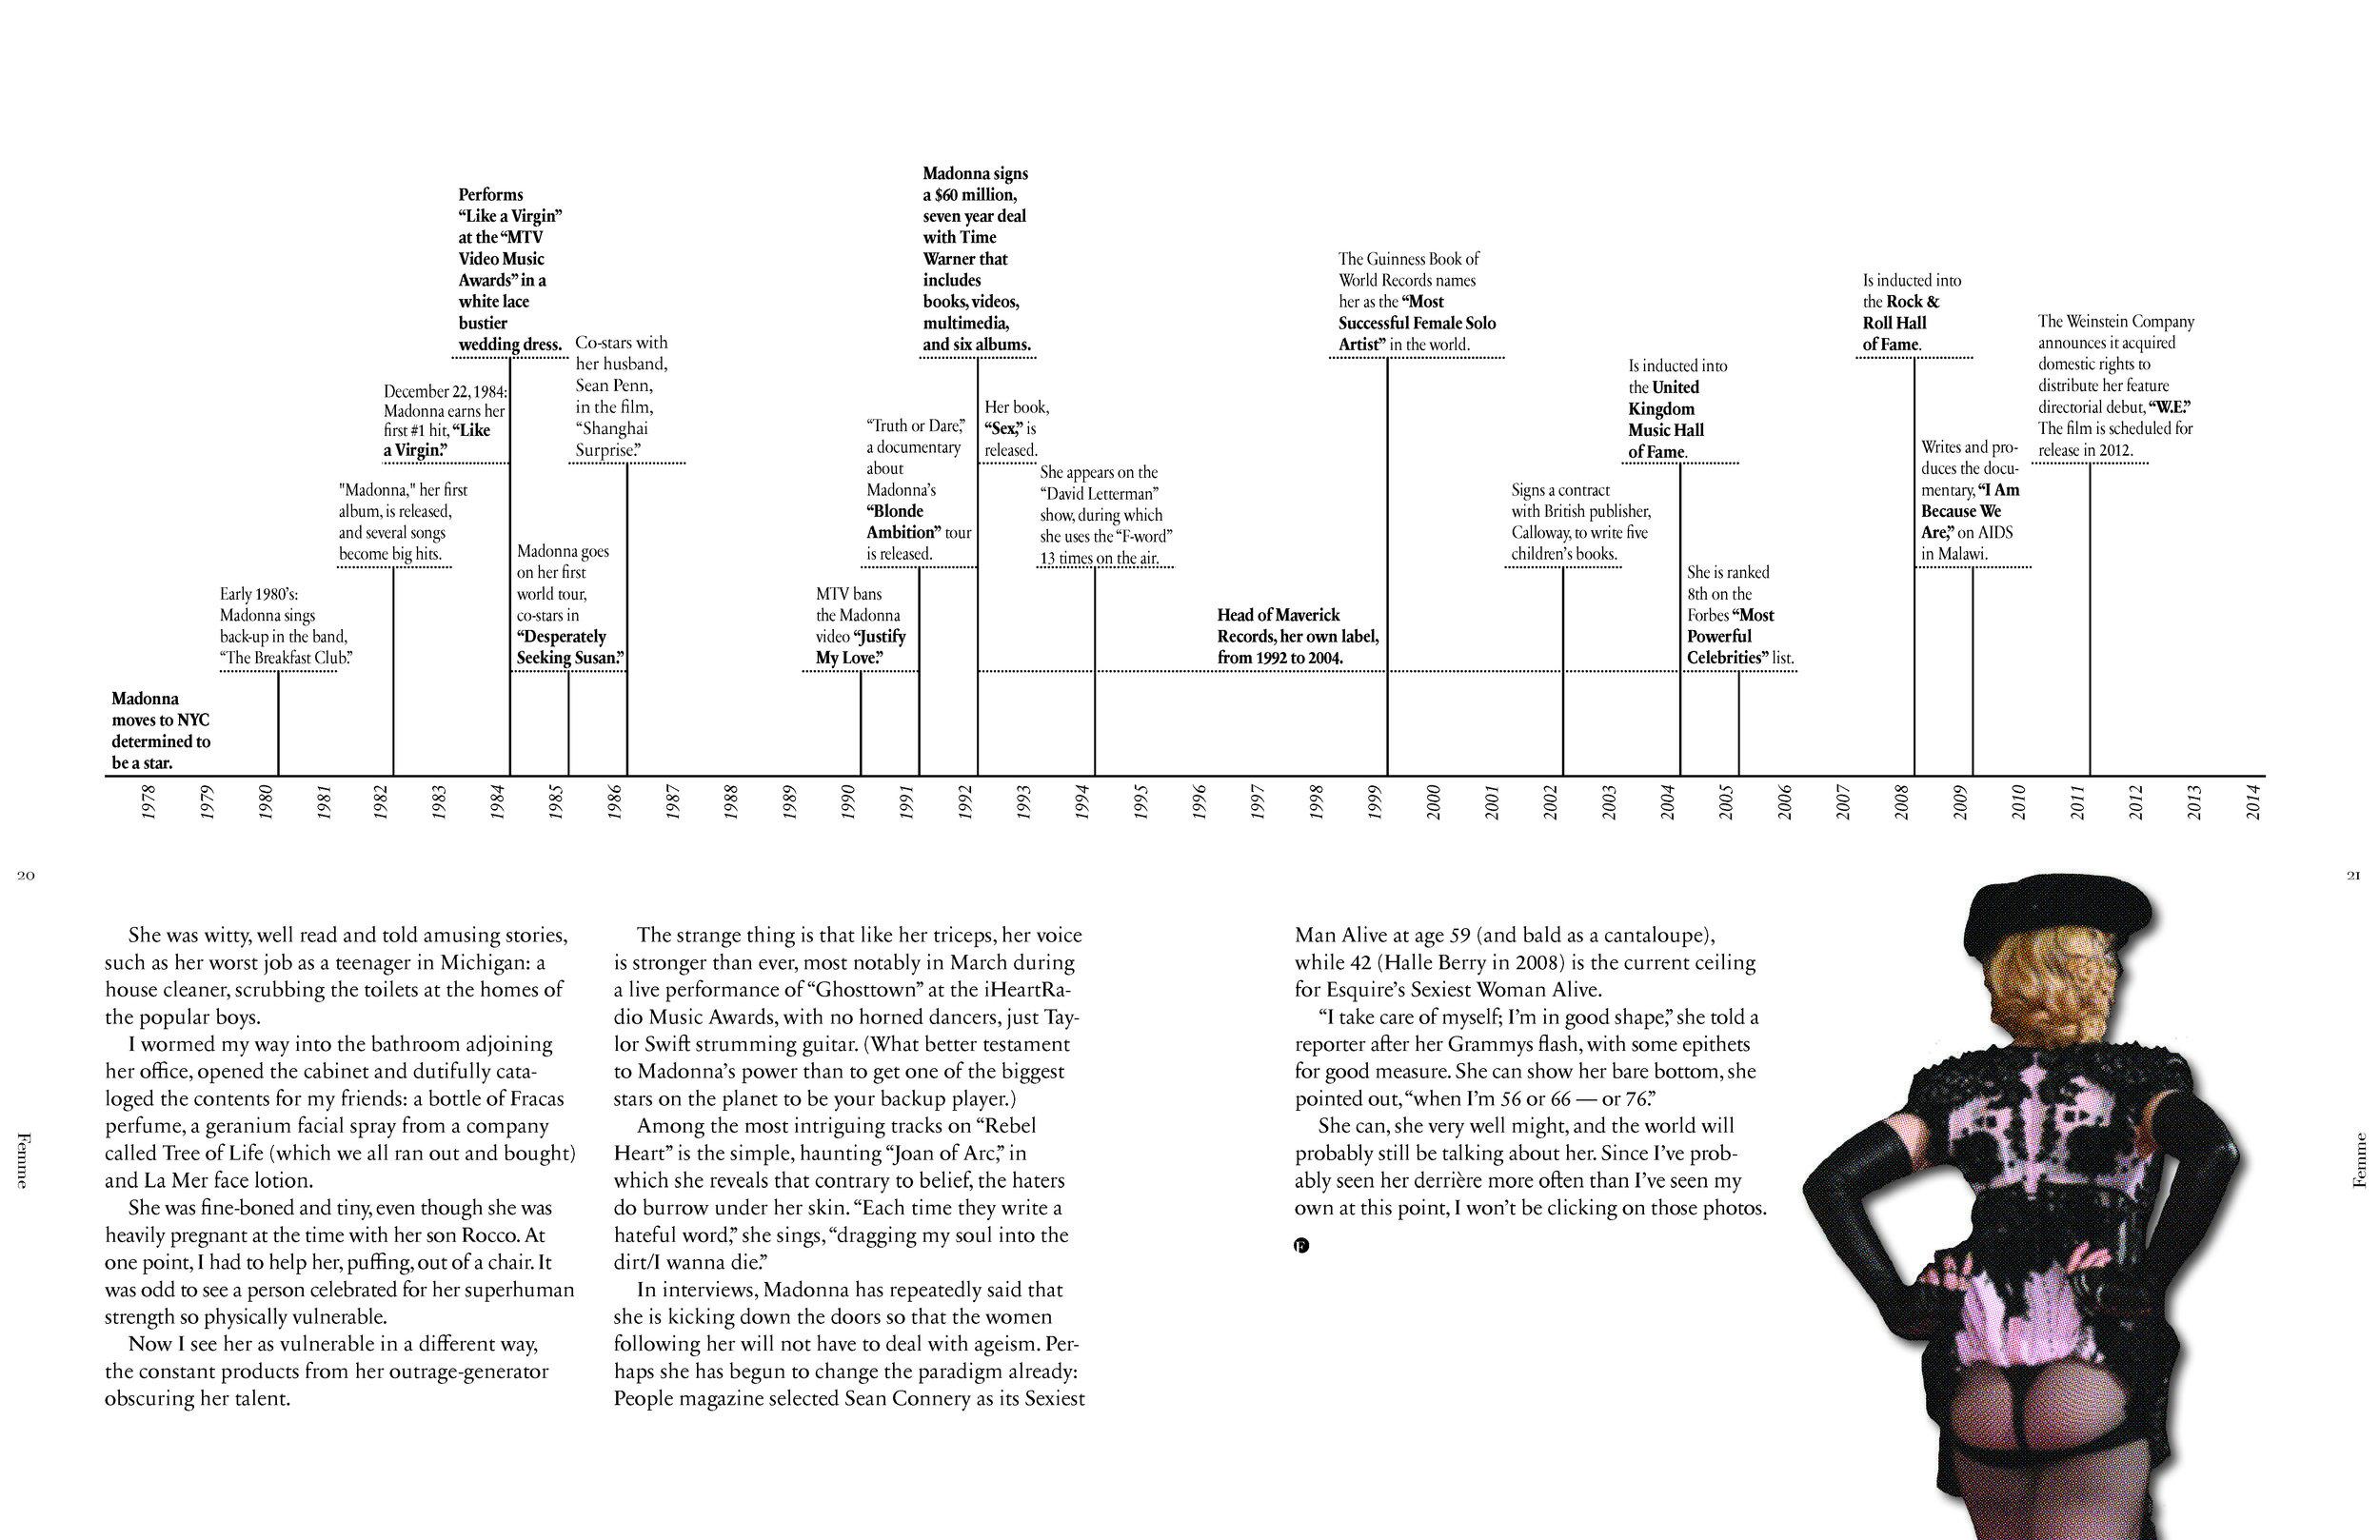 Madonna Article_spread2.jpg